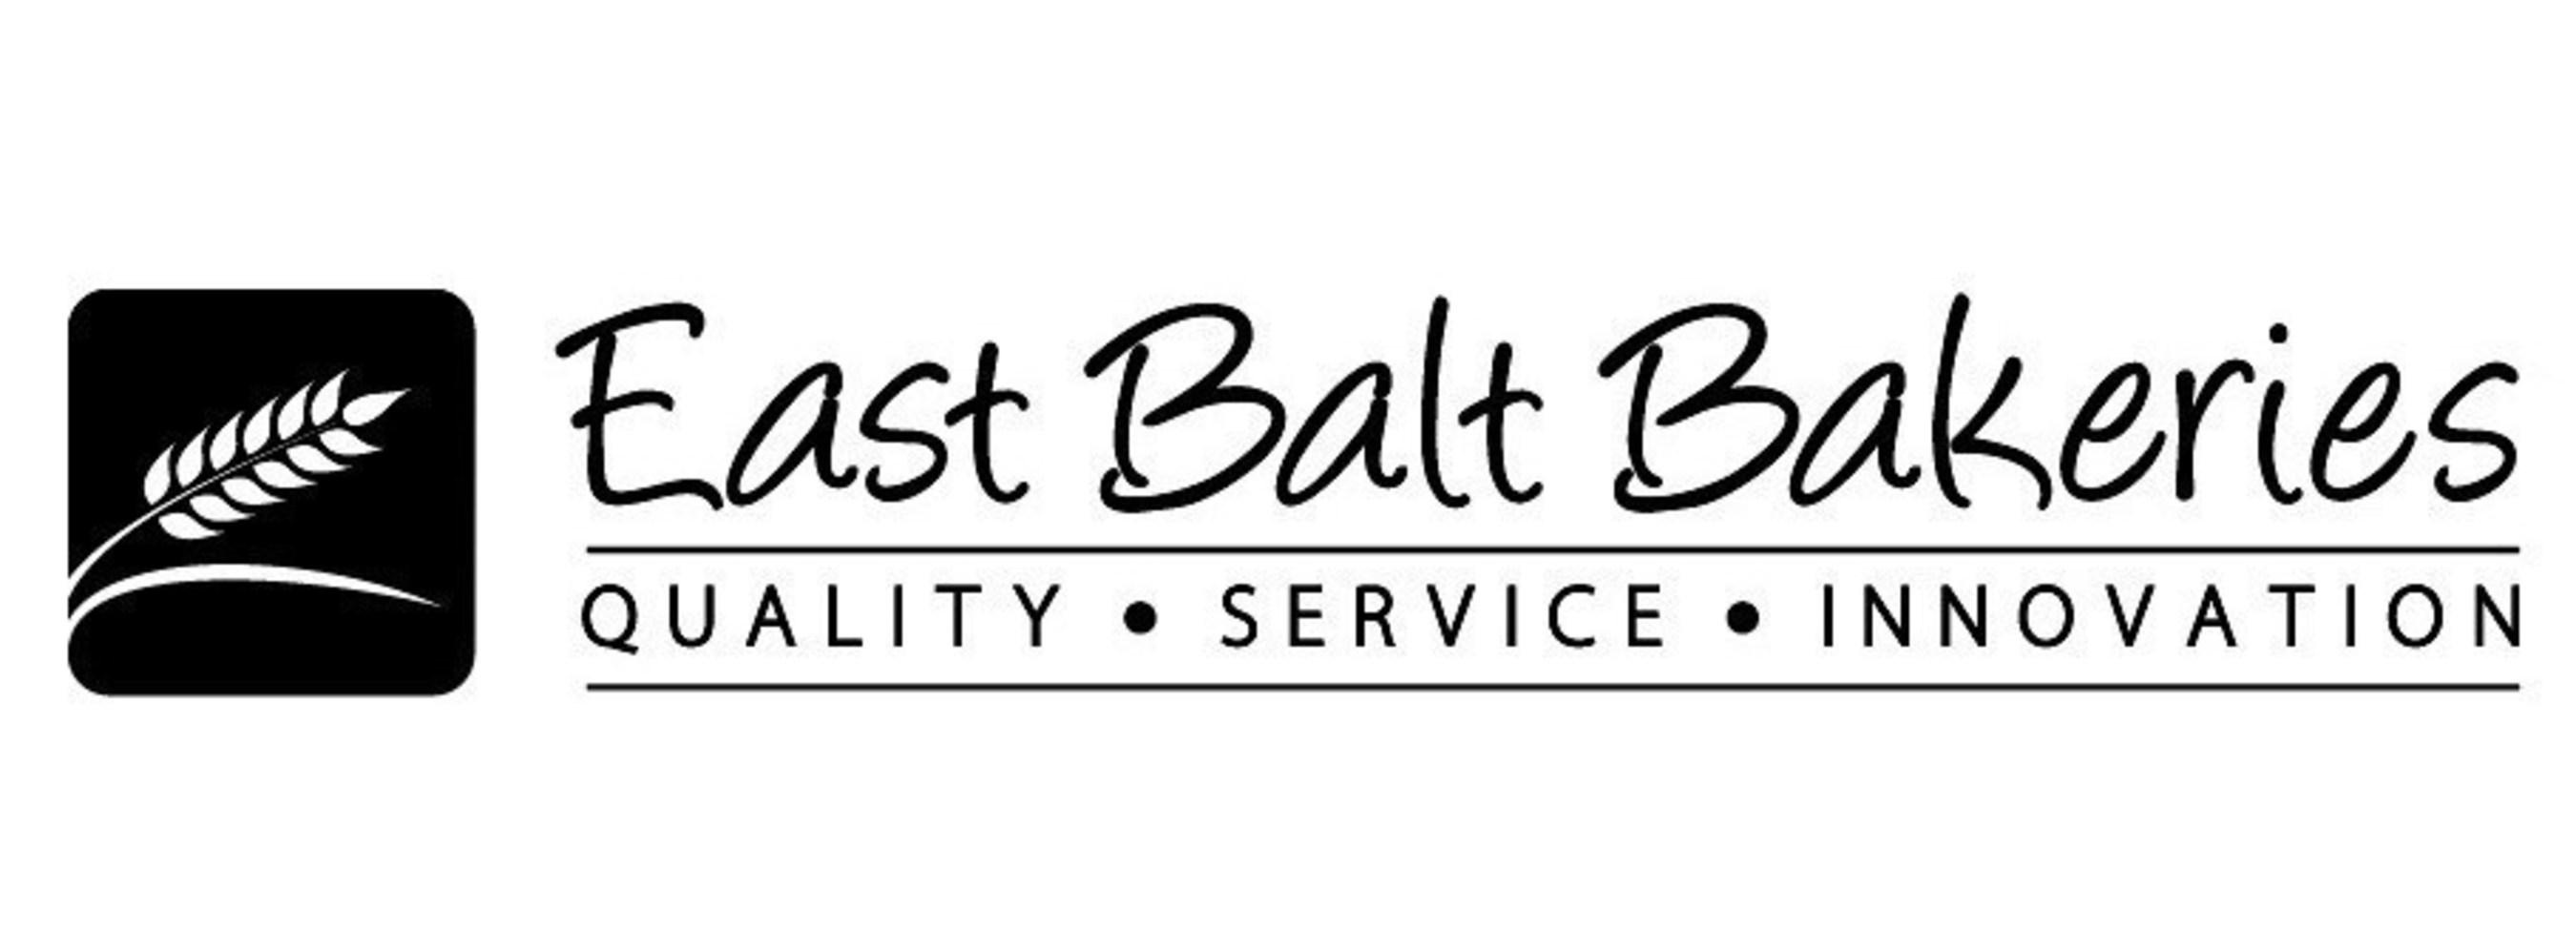 East Balt Bakeries Logo